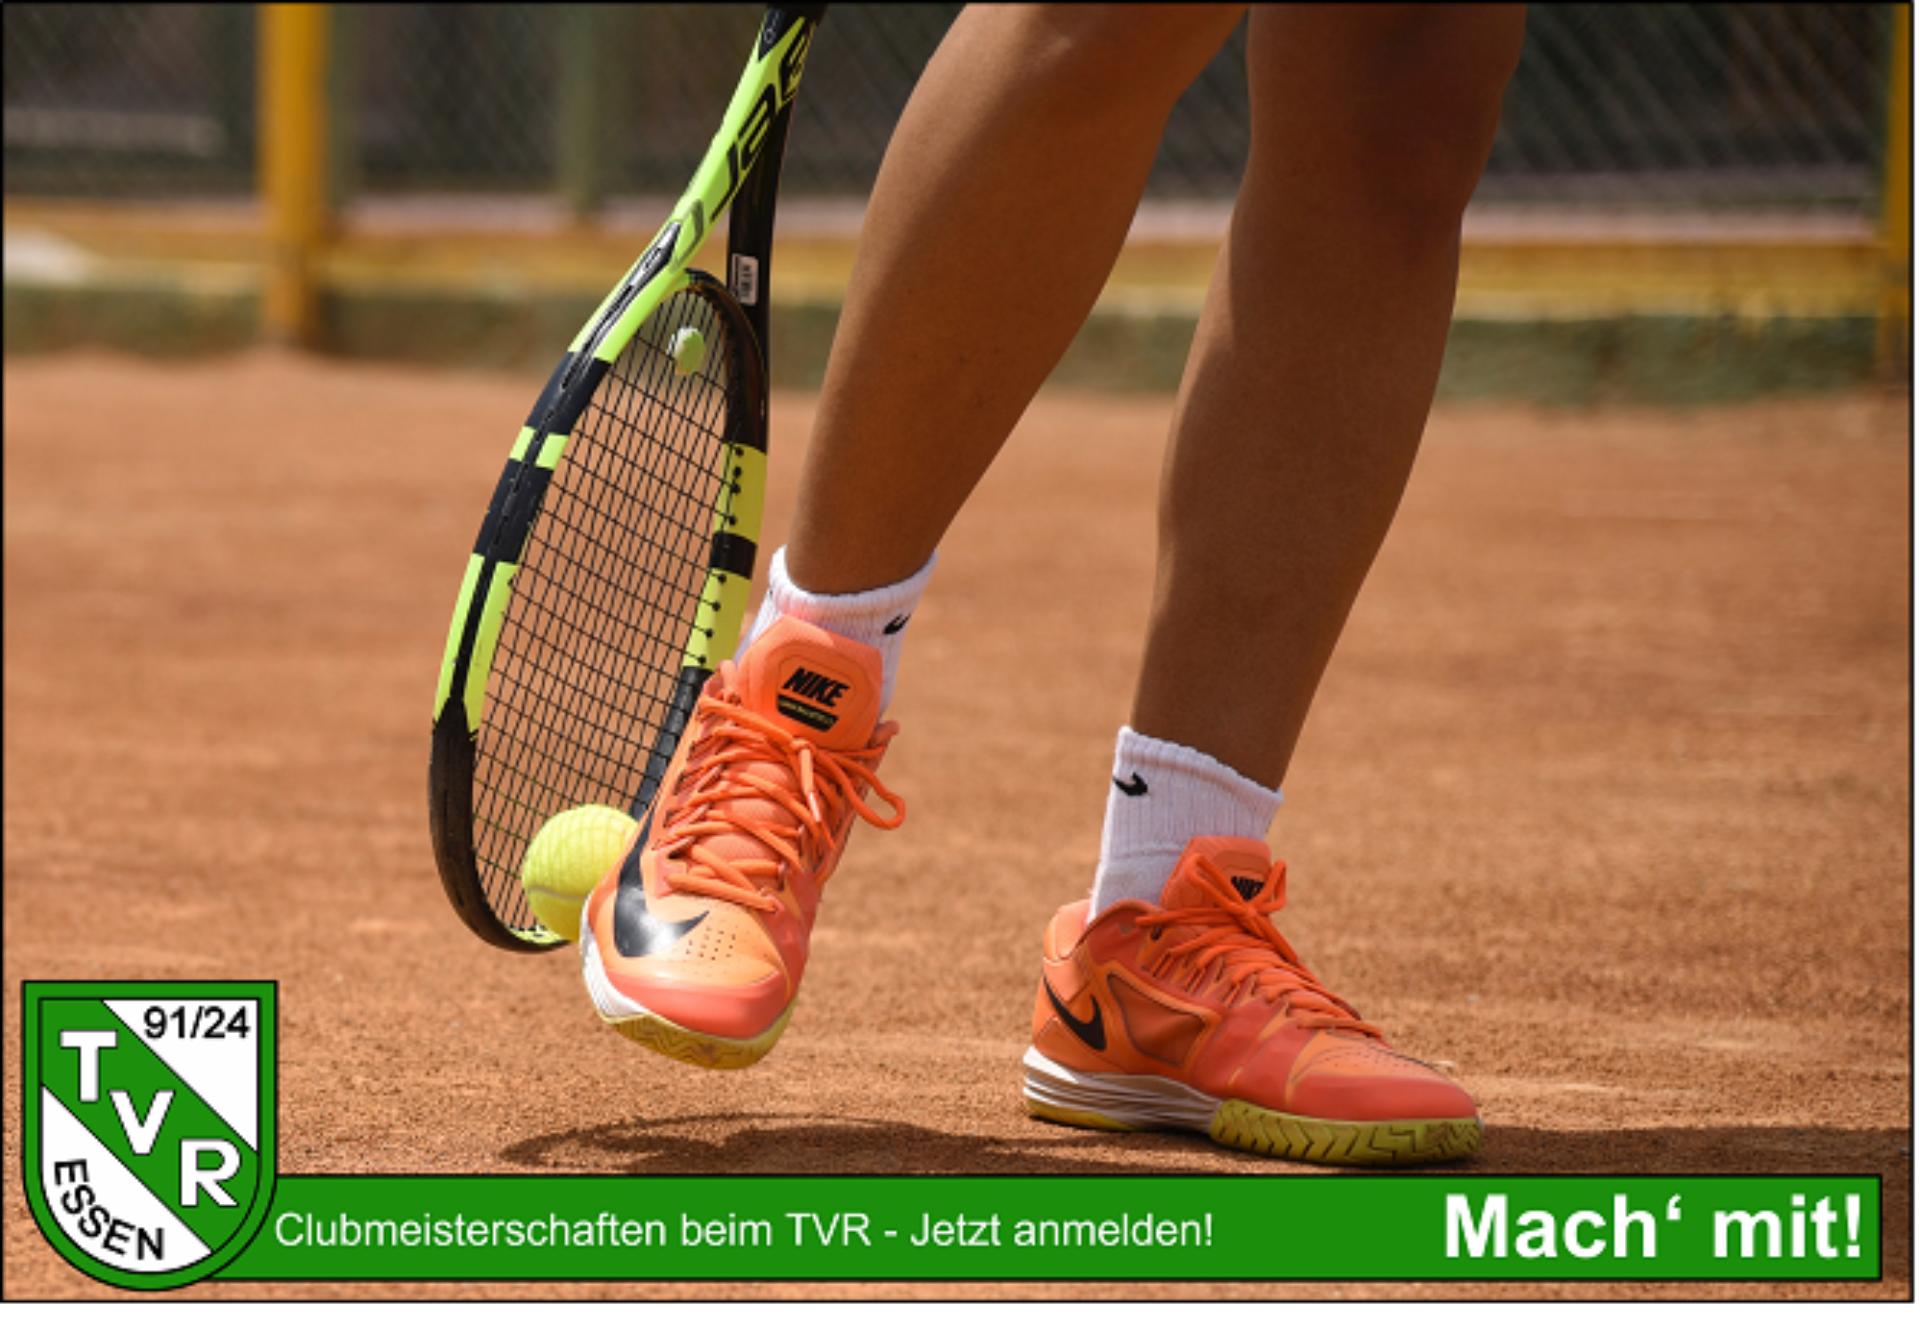 TV Rellinghausen 91/24 e.V.   Abteilung Tennis